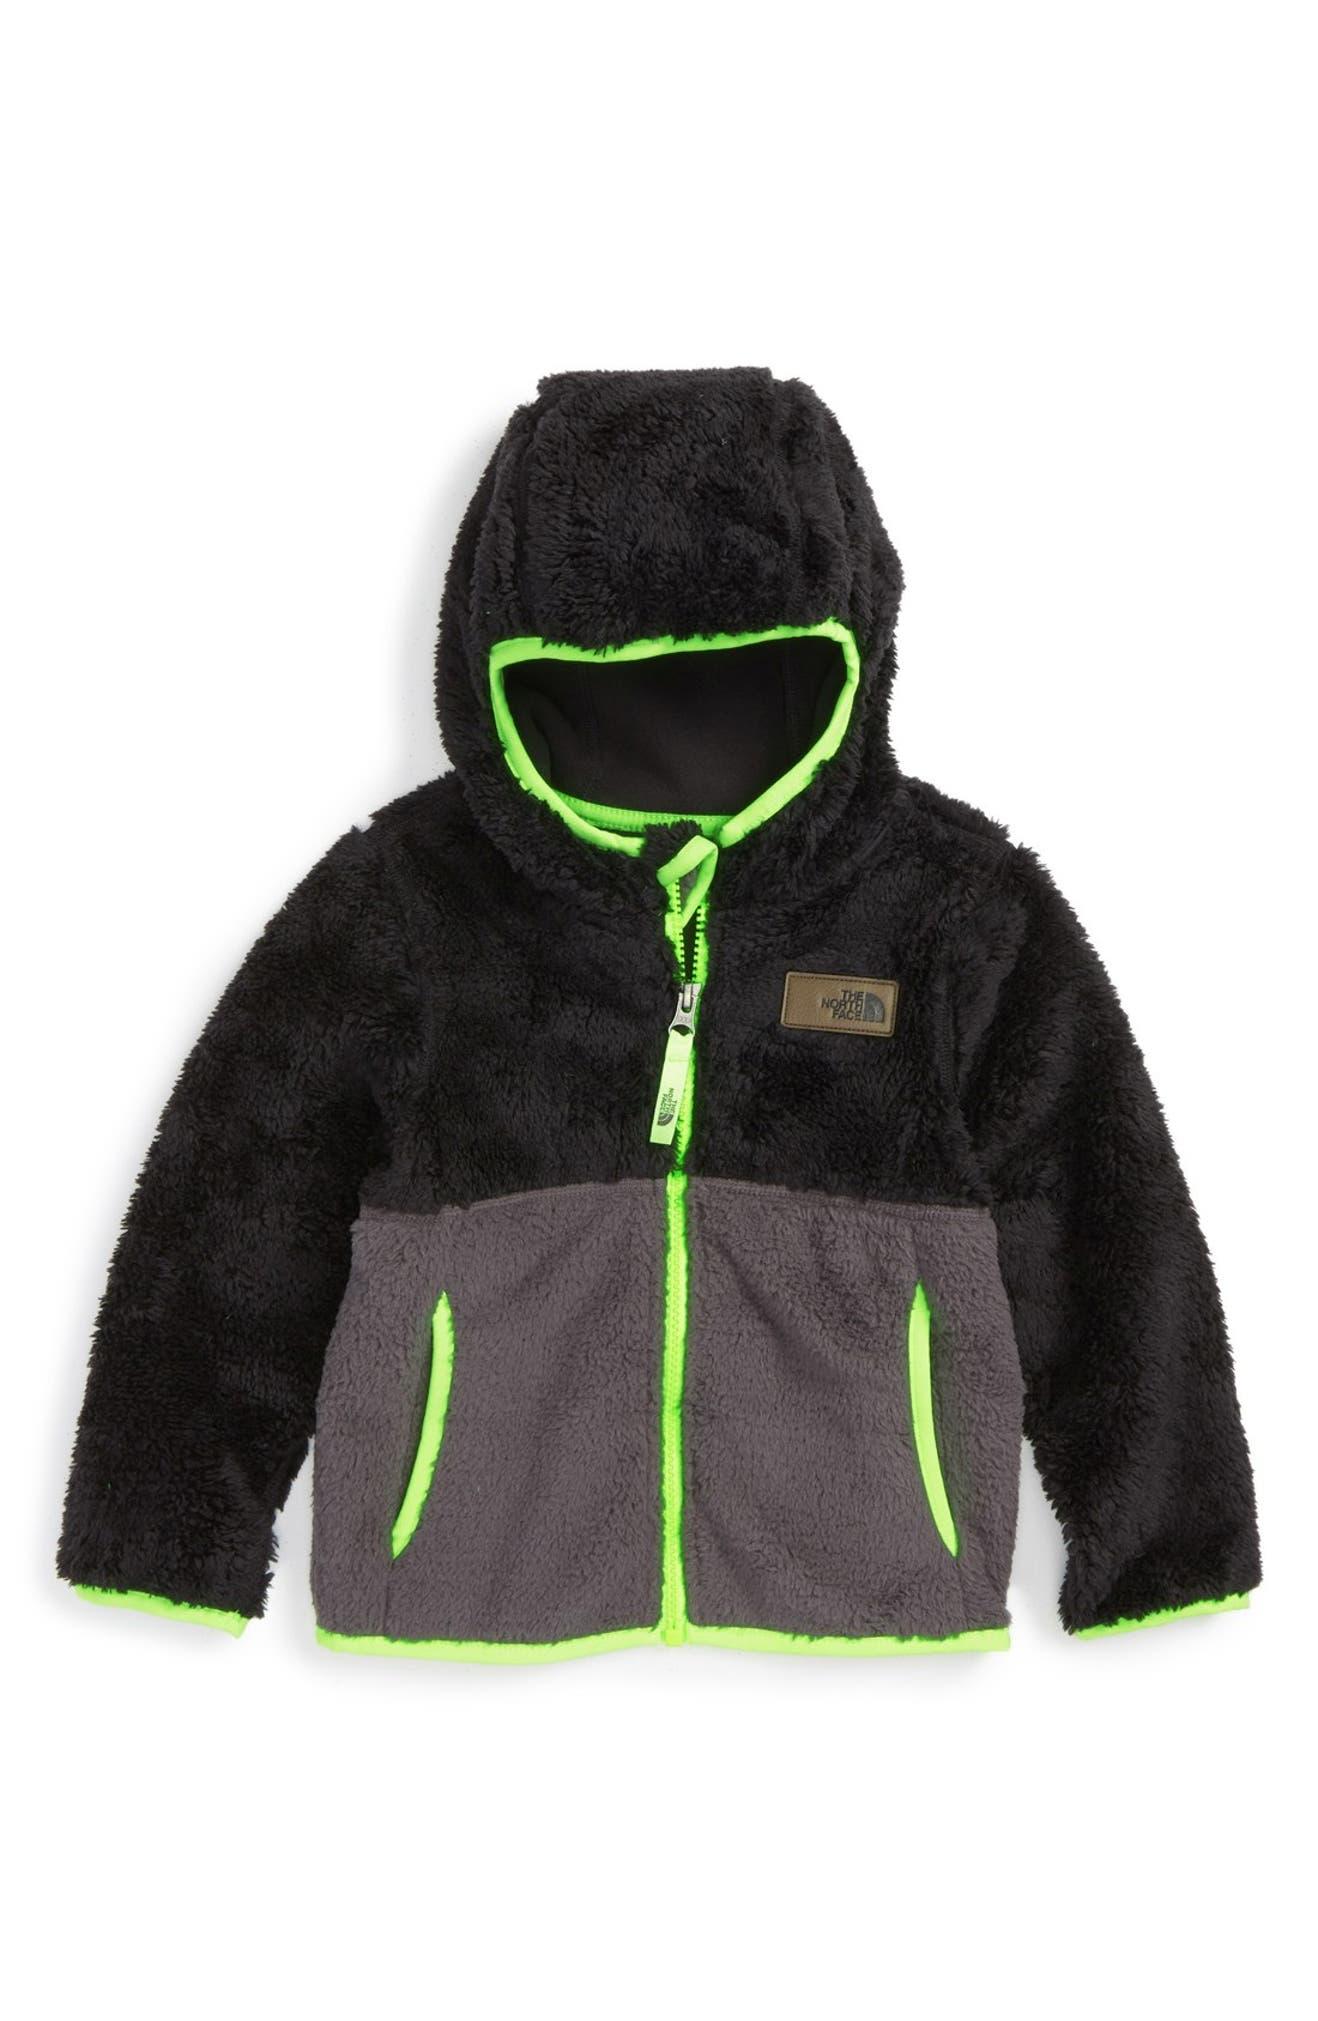 ceaf3daf3ebe The North Face Sherparazo Jacket (Toddler Boys   Little Boys ...